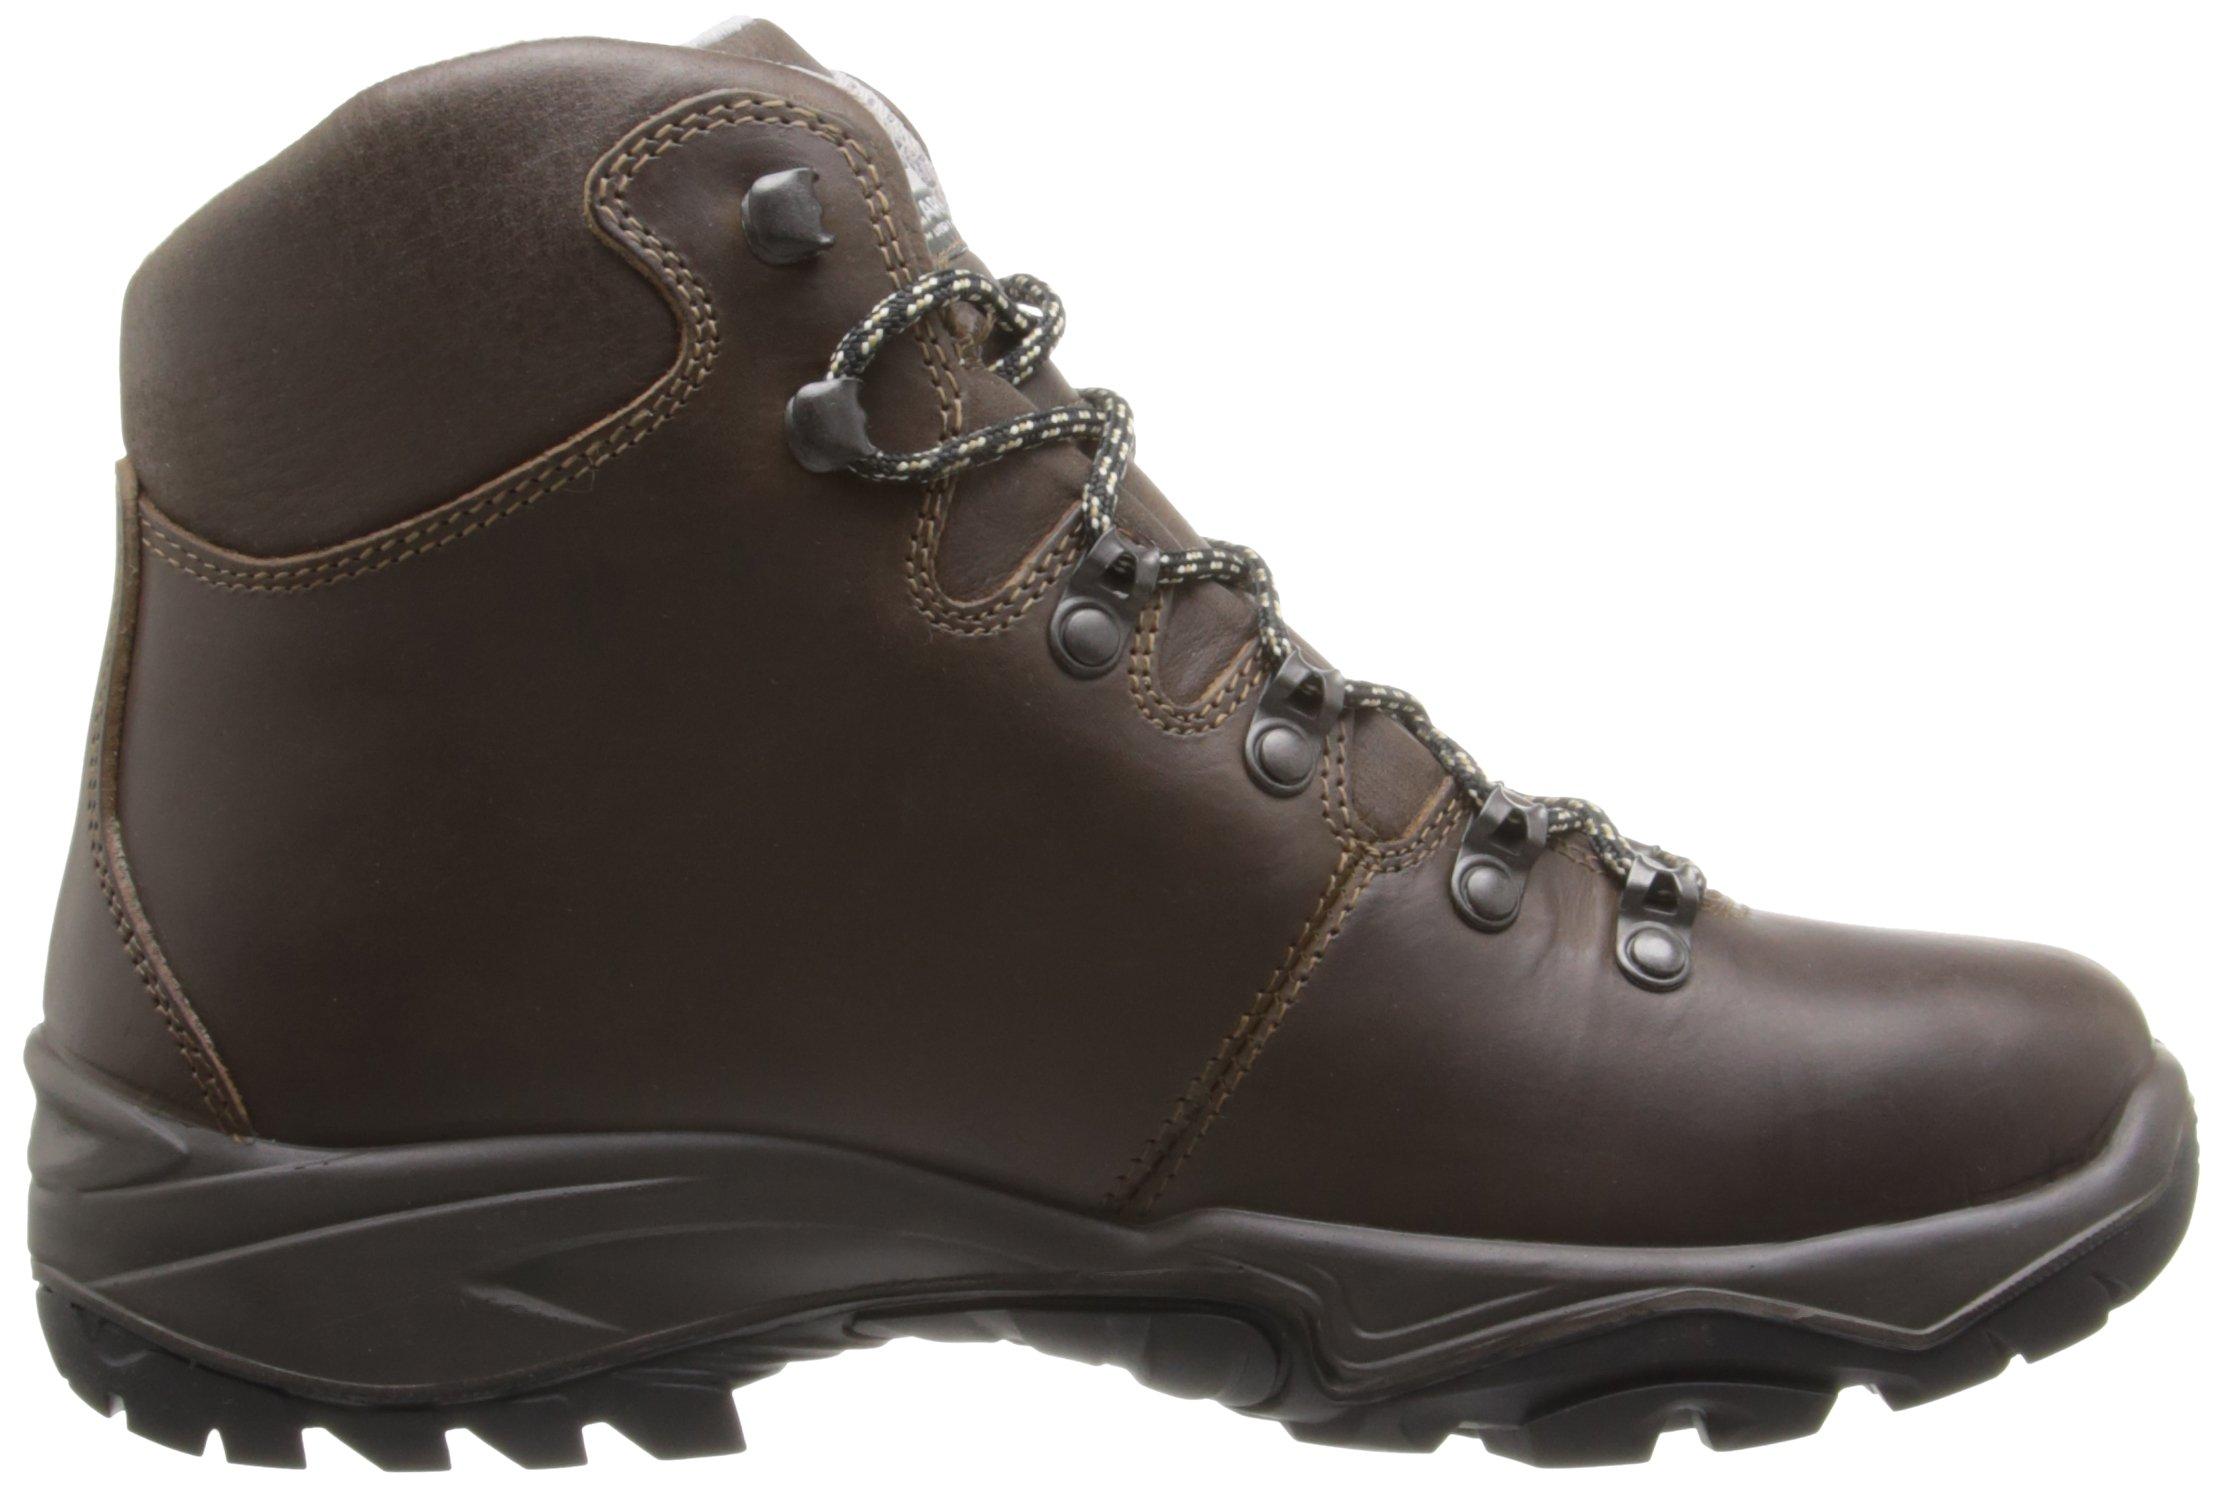 Scarpa Womens Women's Terra GTX Hiking Boot,Brown,42 EU/10 M US by SCARPA (Image #6)